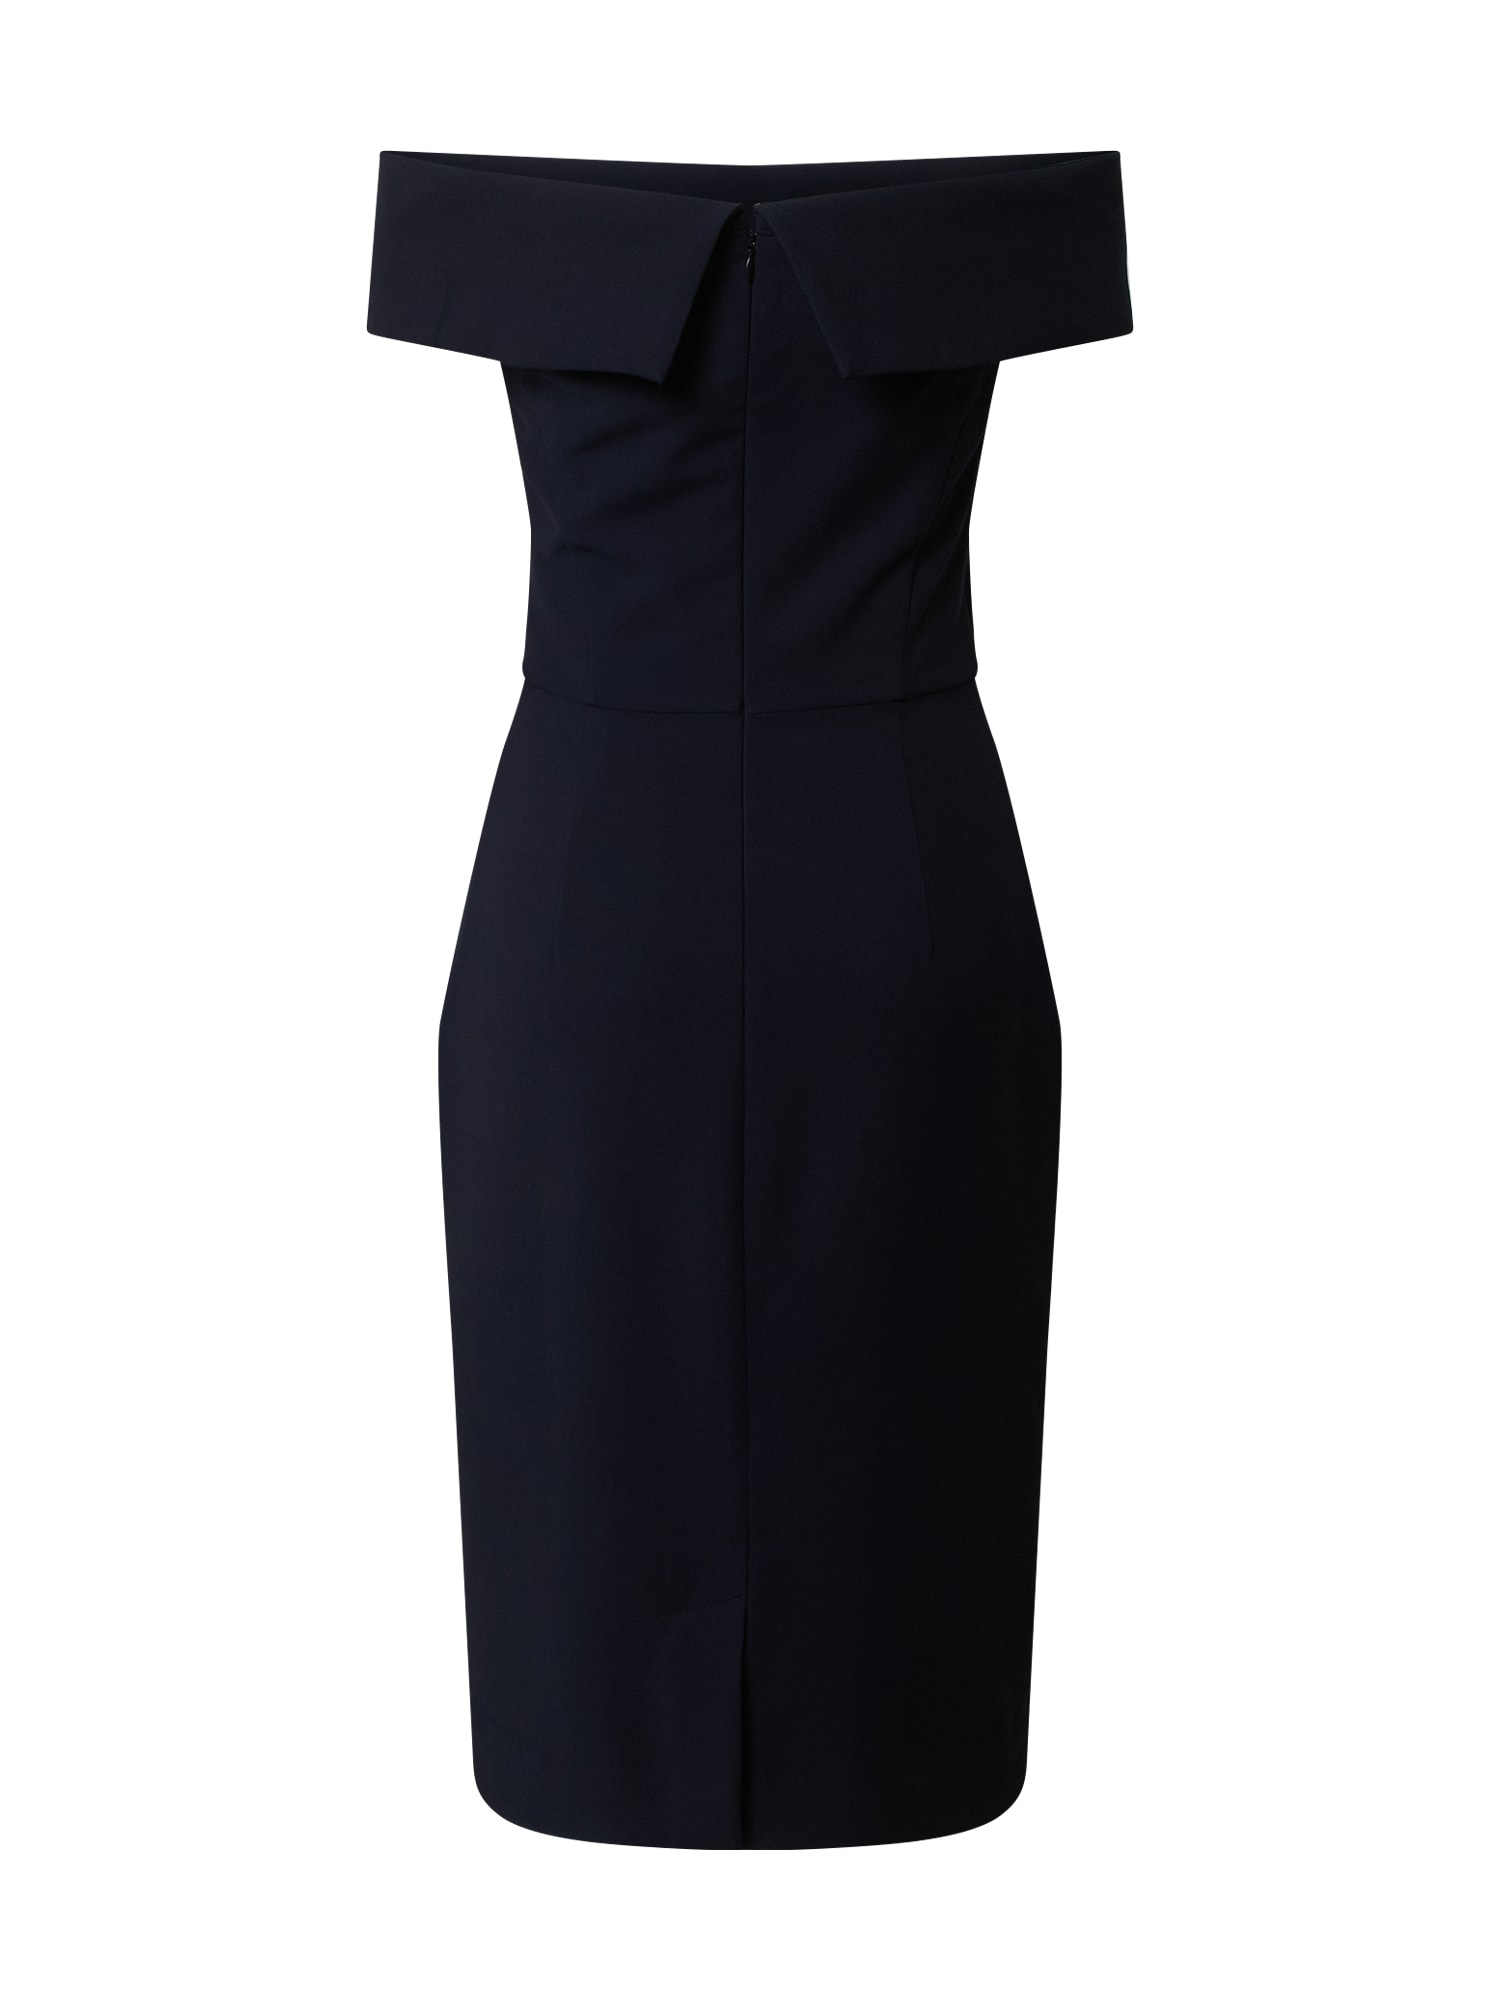 ivy & oak - Kleid 'CARMEN COCKTAIL DRESS'